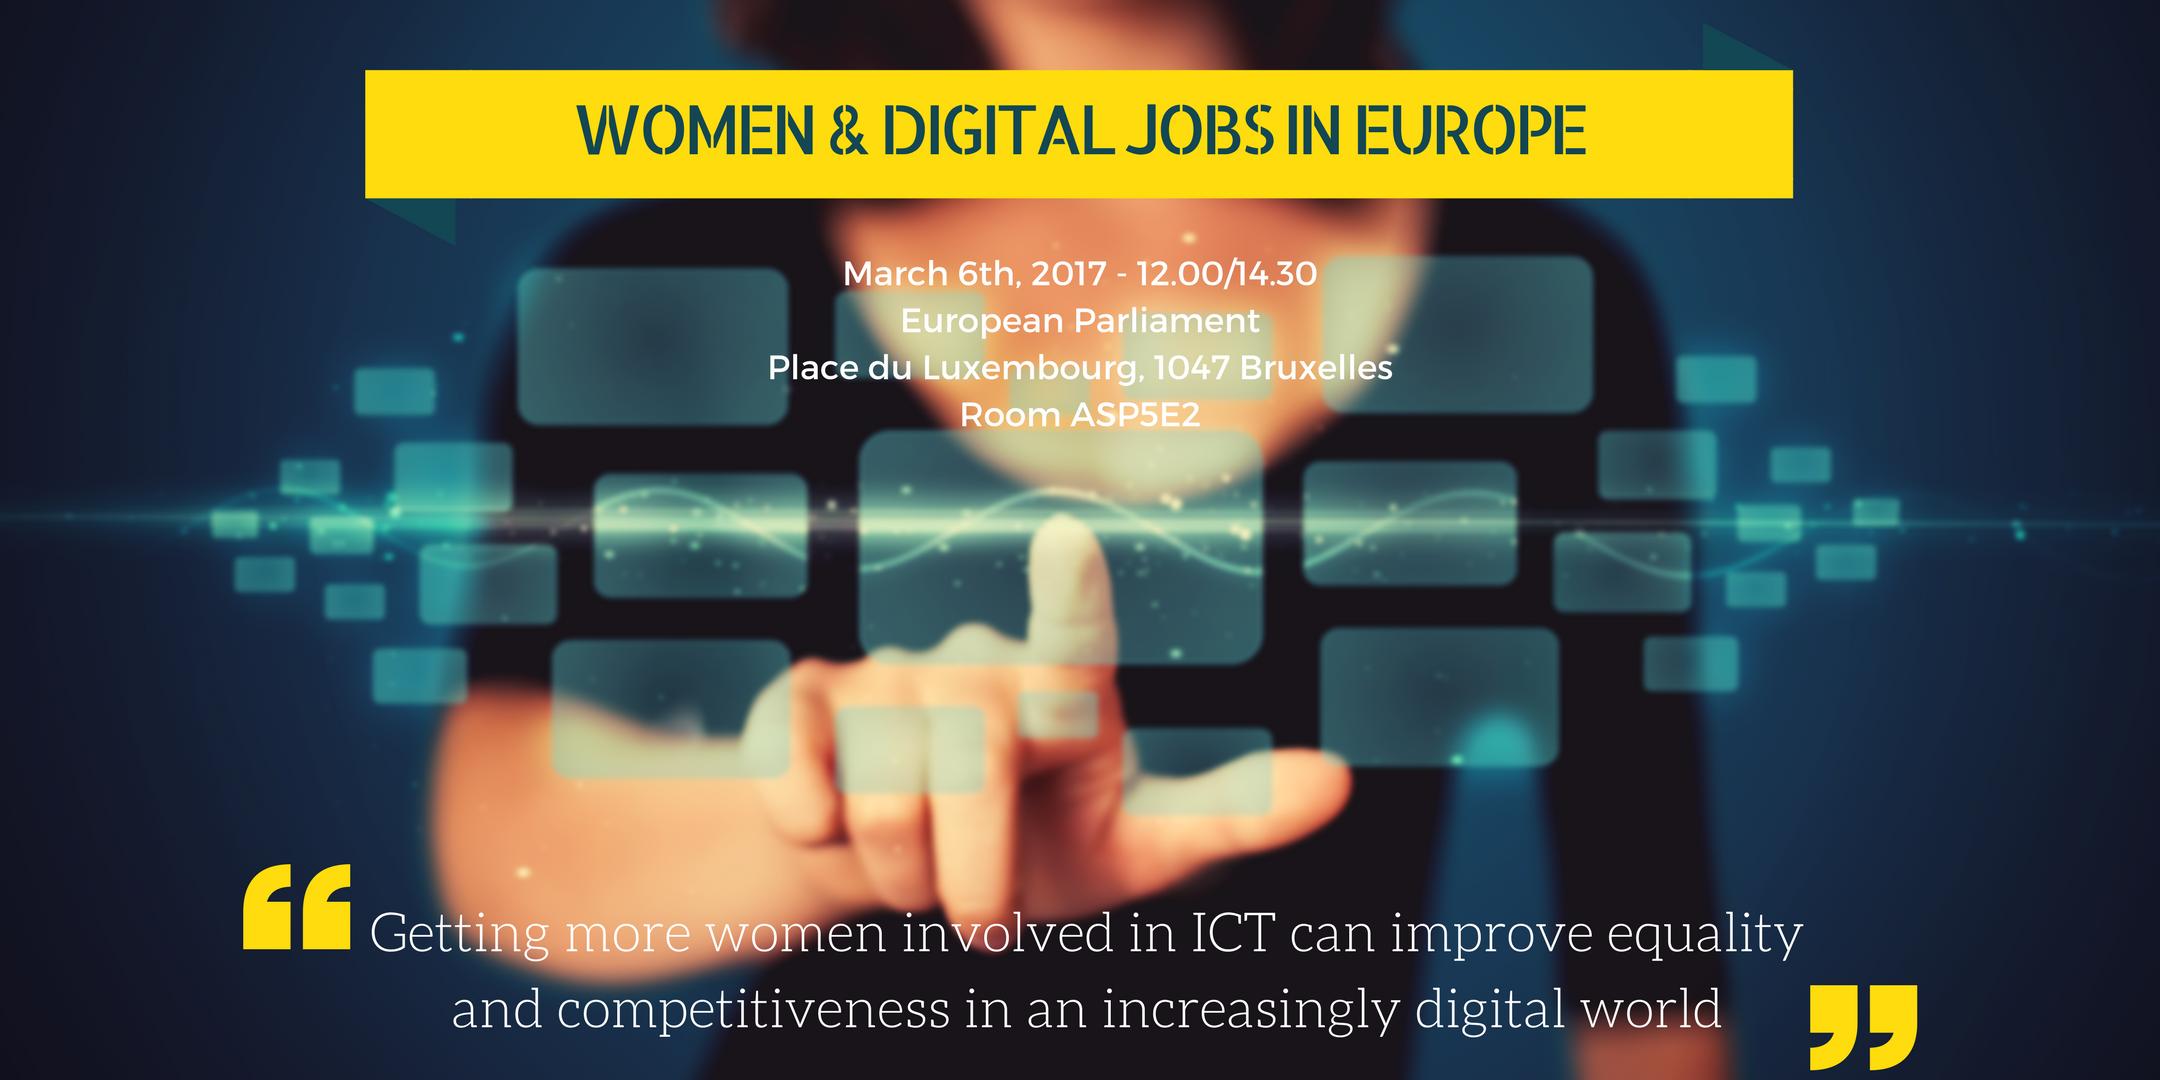 Europa chiama, Women&tech risponde